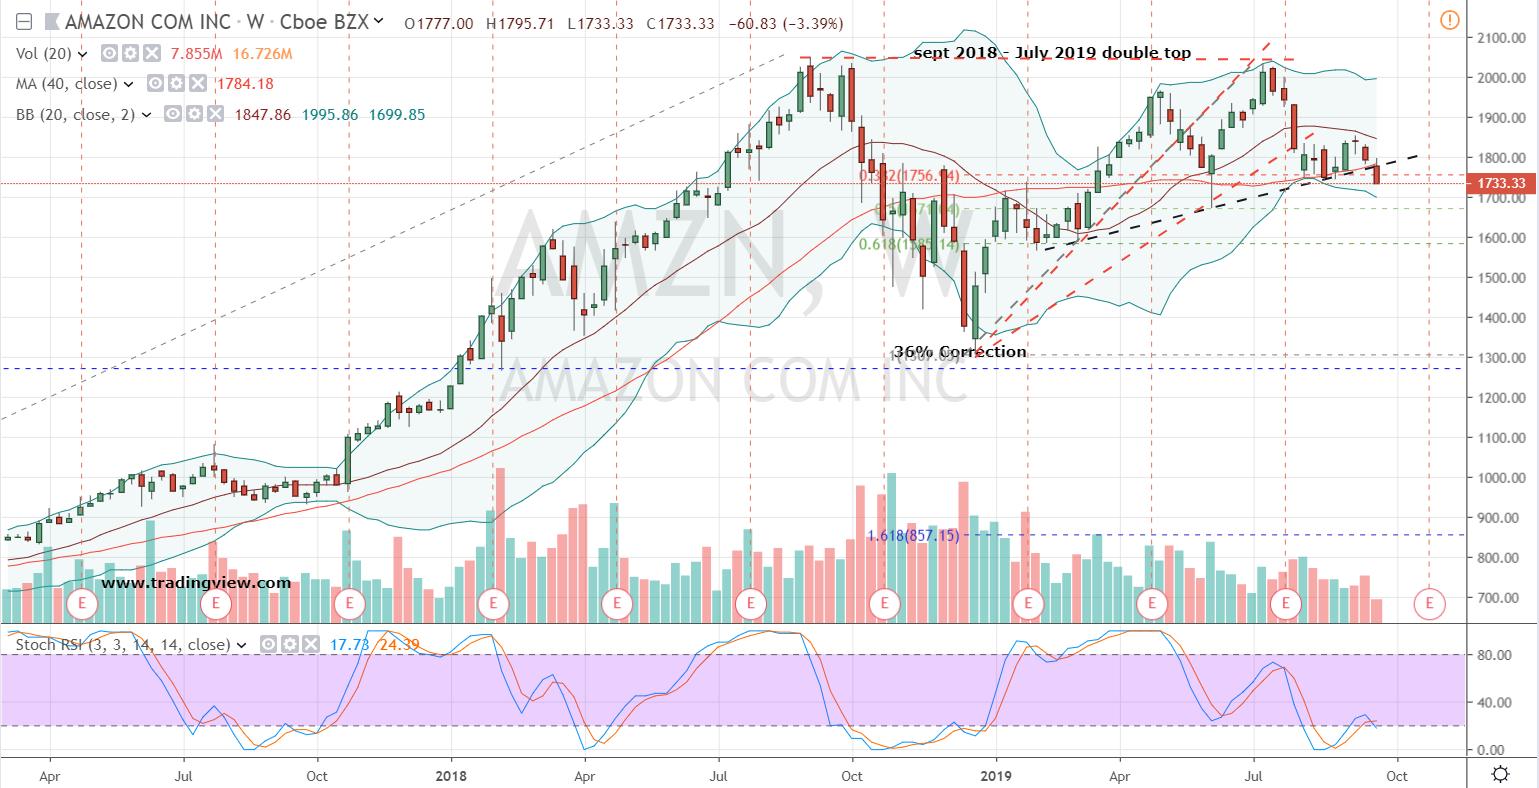 Tech Stocks to Trade: Amazon (AMZN)